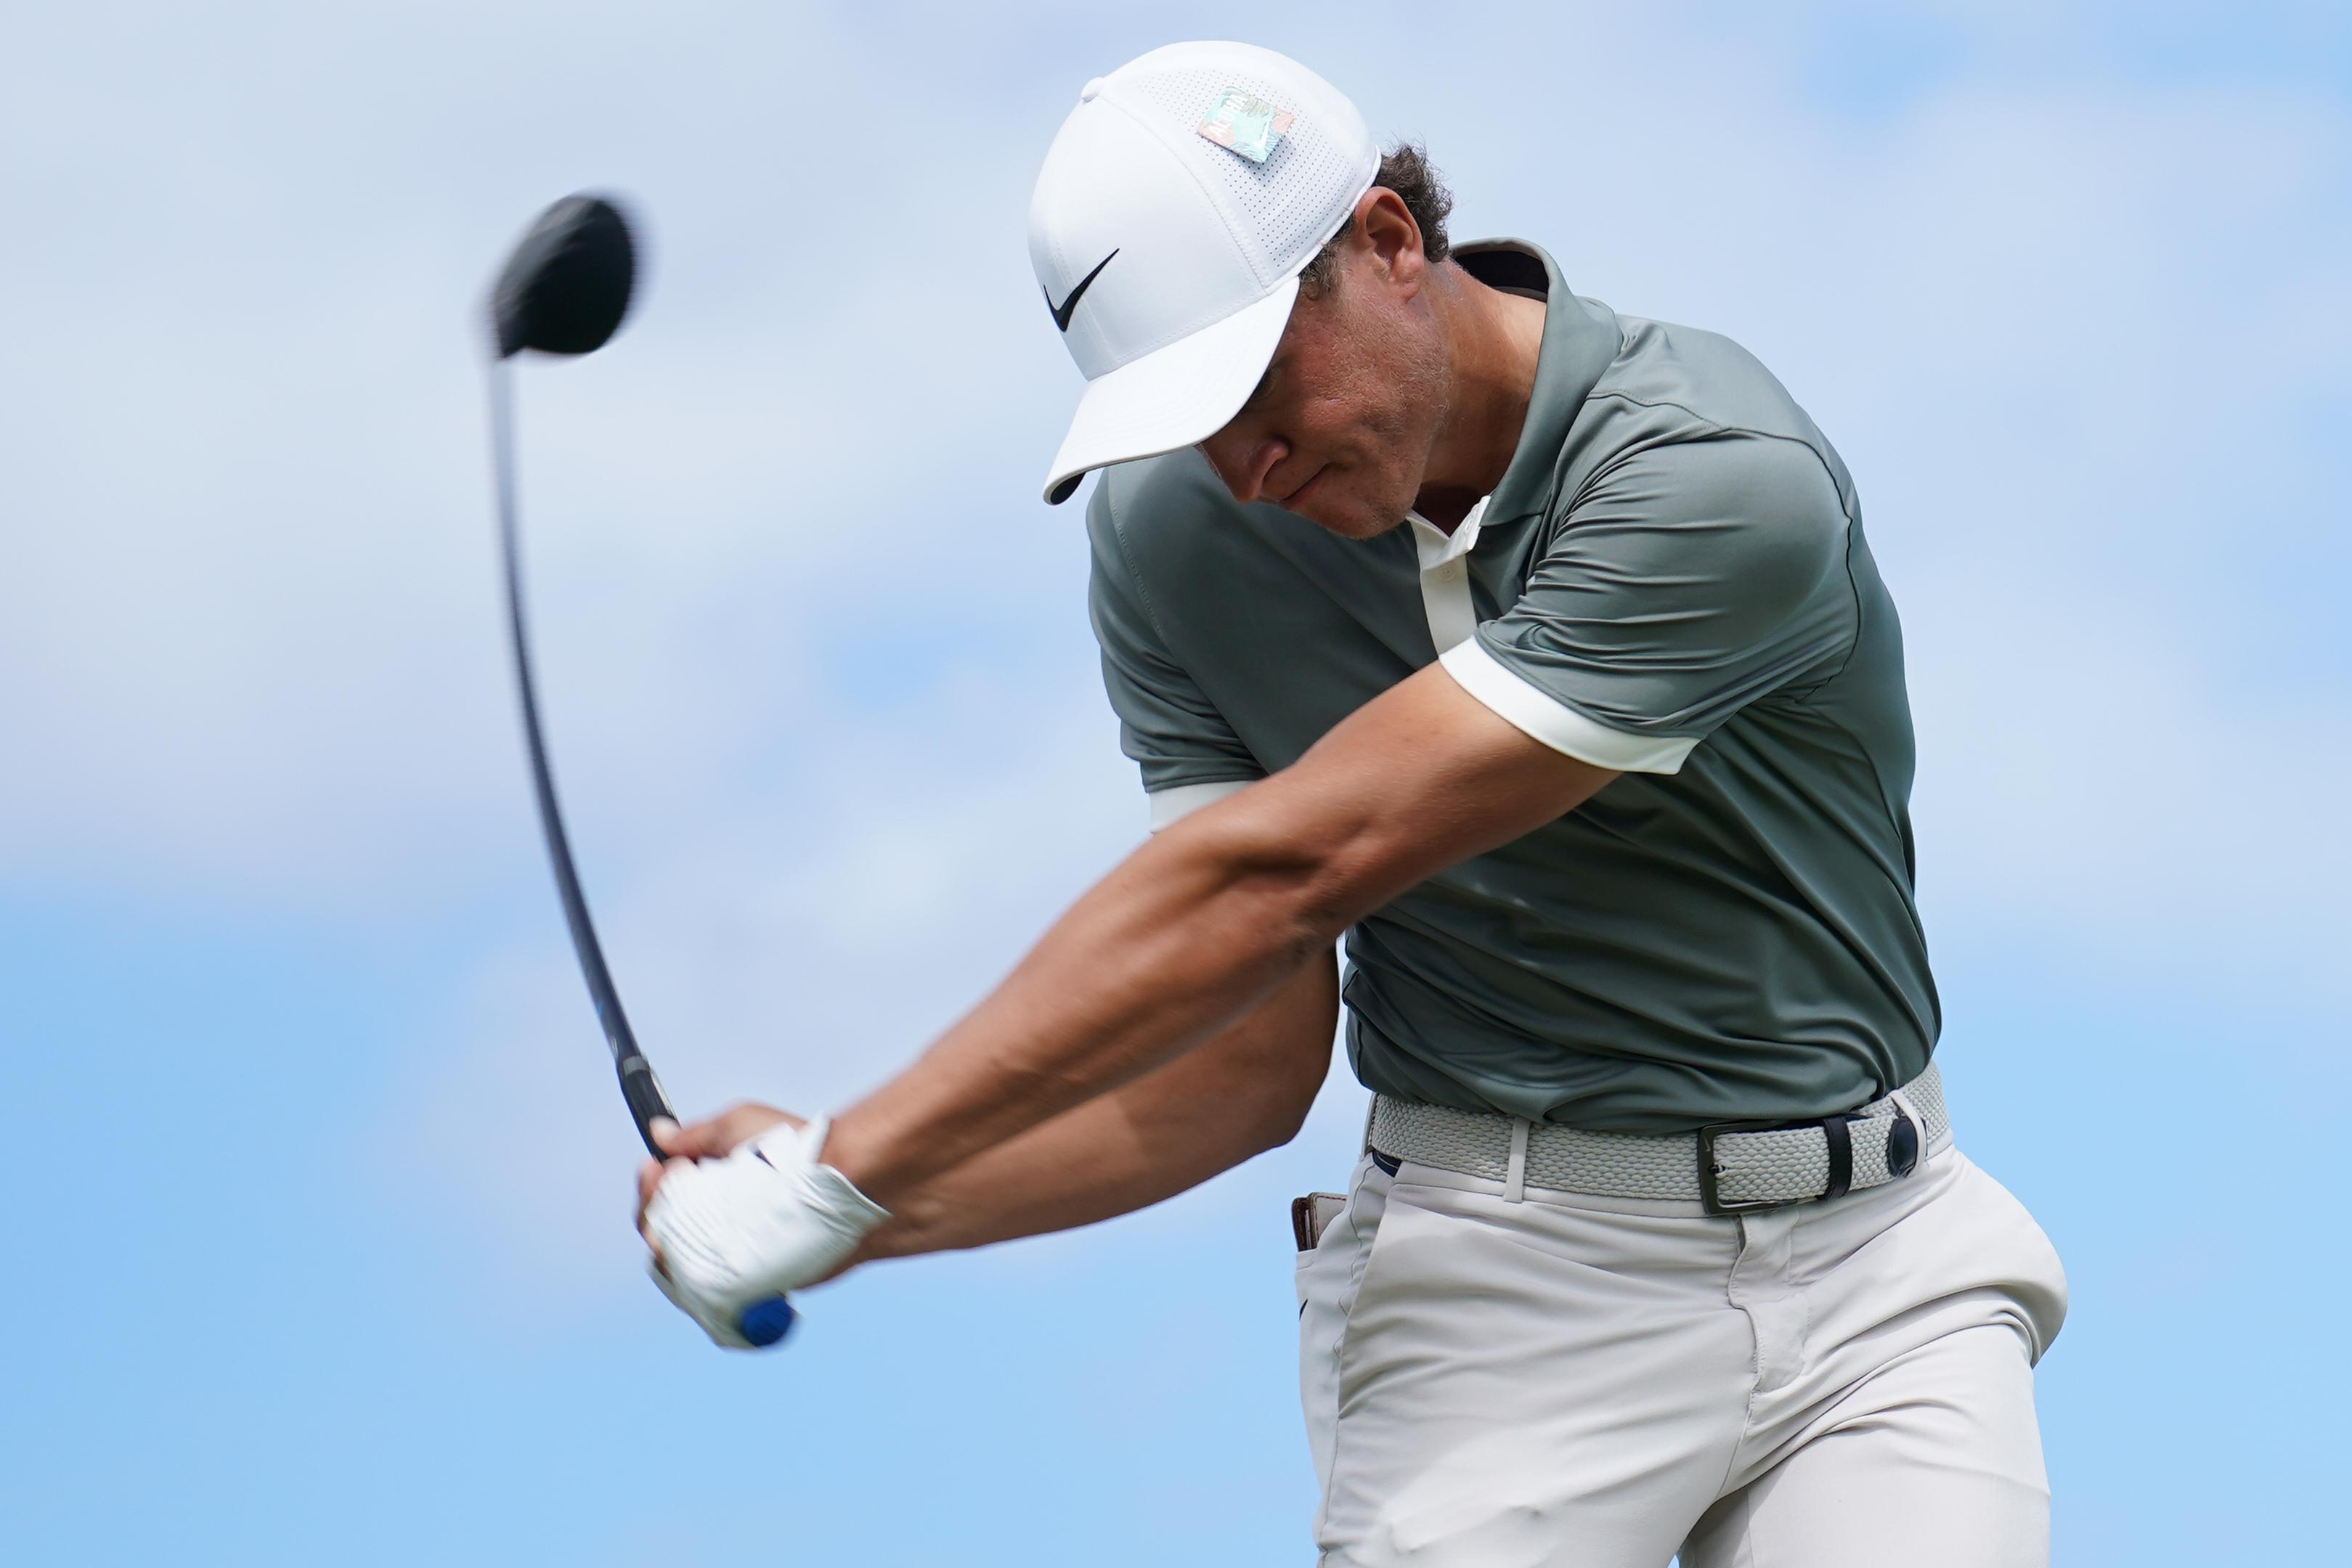 Cameron Champ driver golf ball rollback distance